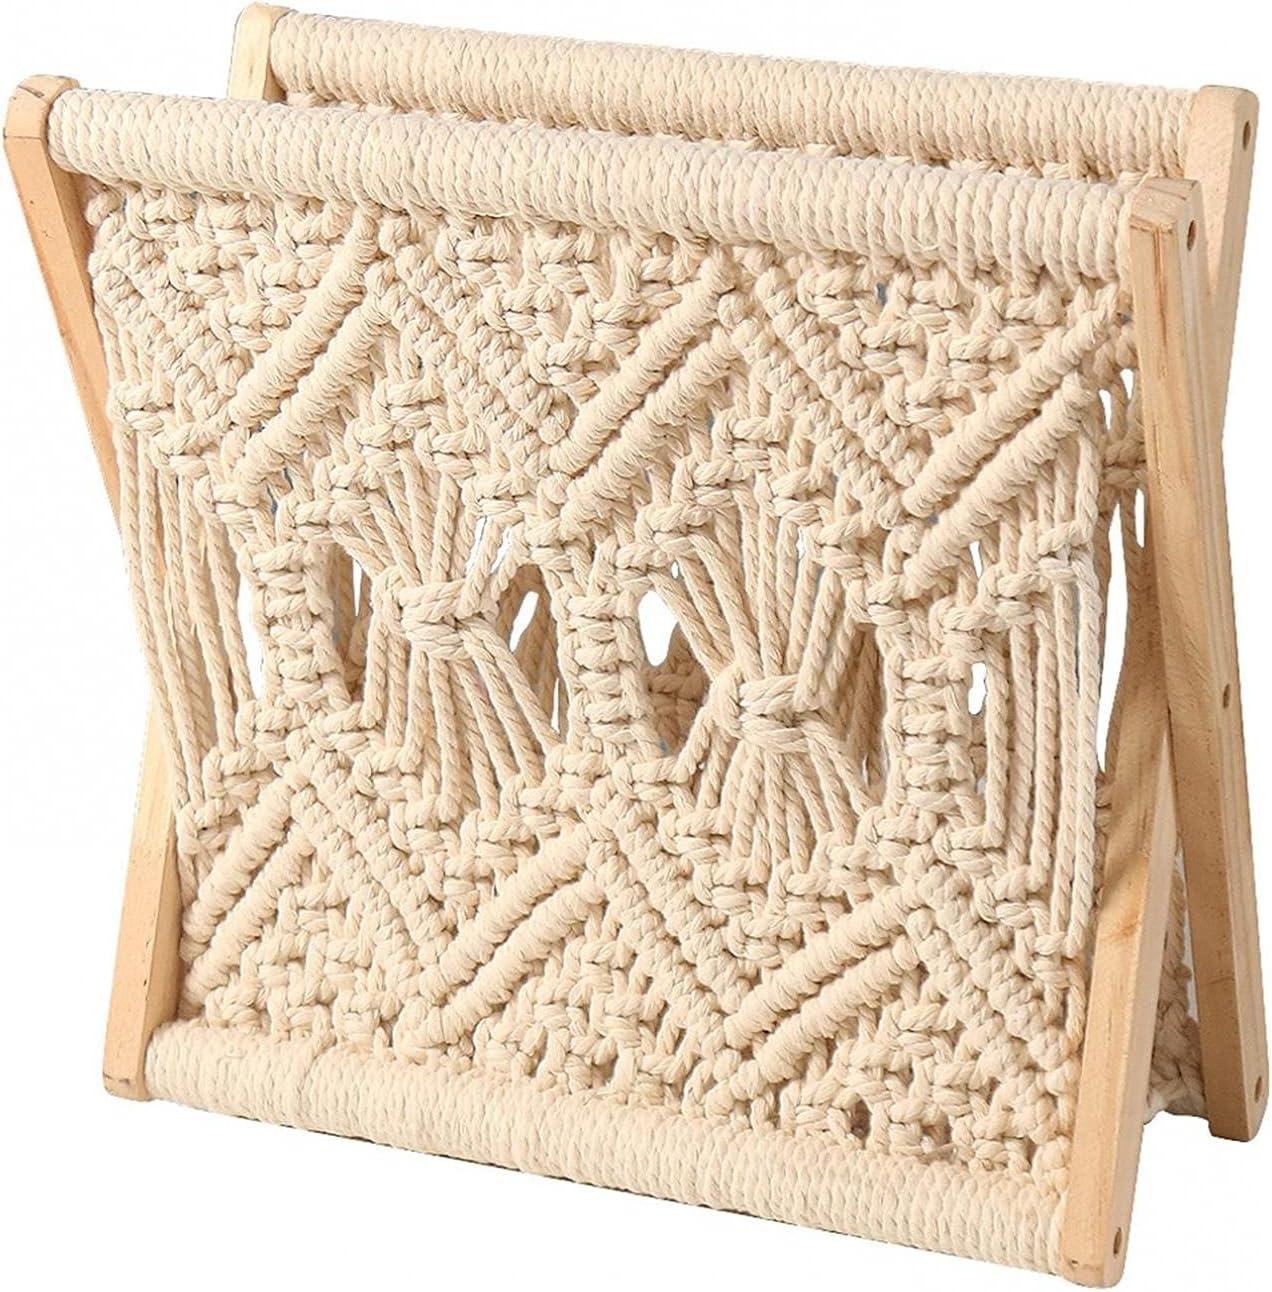 Price reduction ZQCM Hand Woven Magazine Rack Deskto Simple Storage Box Folding Our shop OFFers the best service